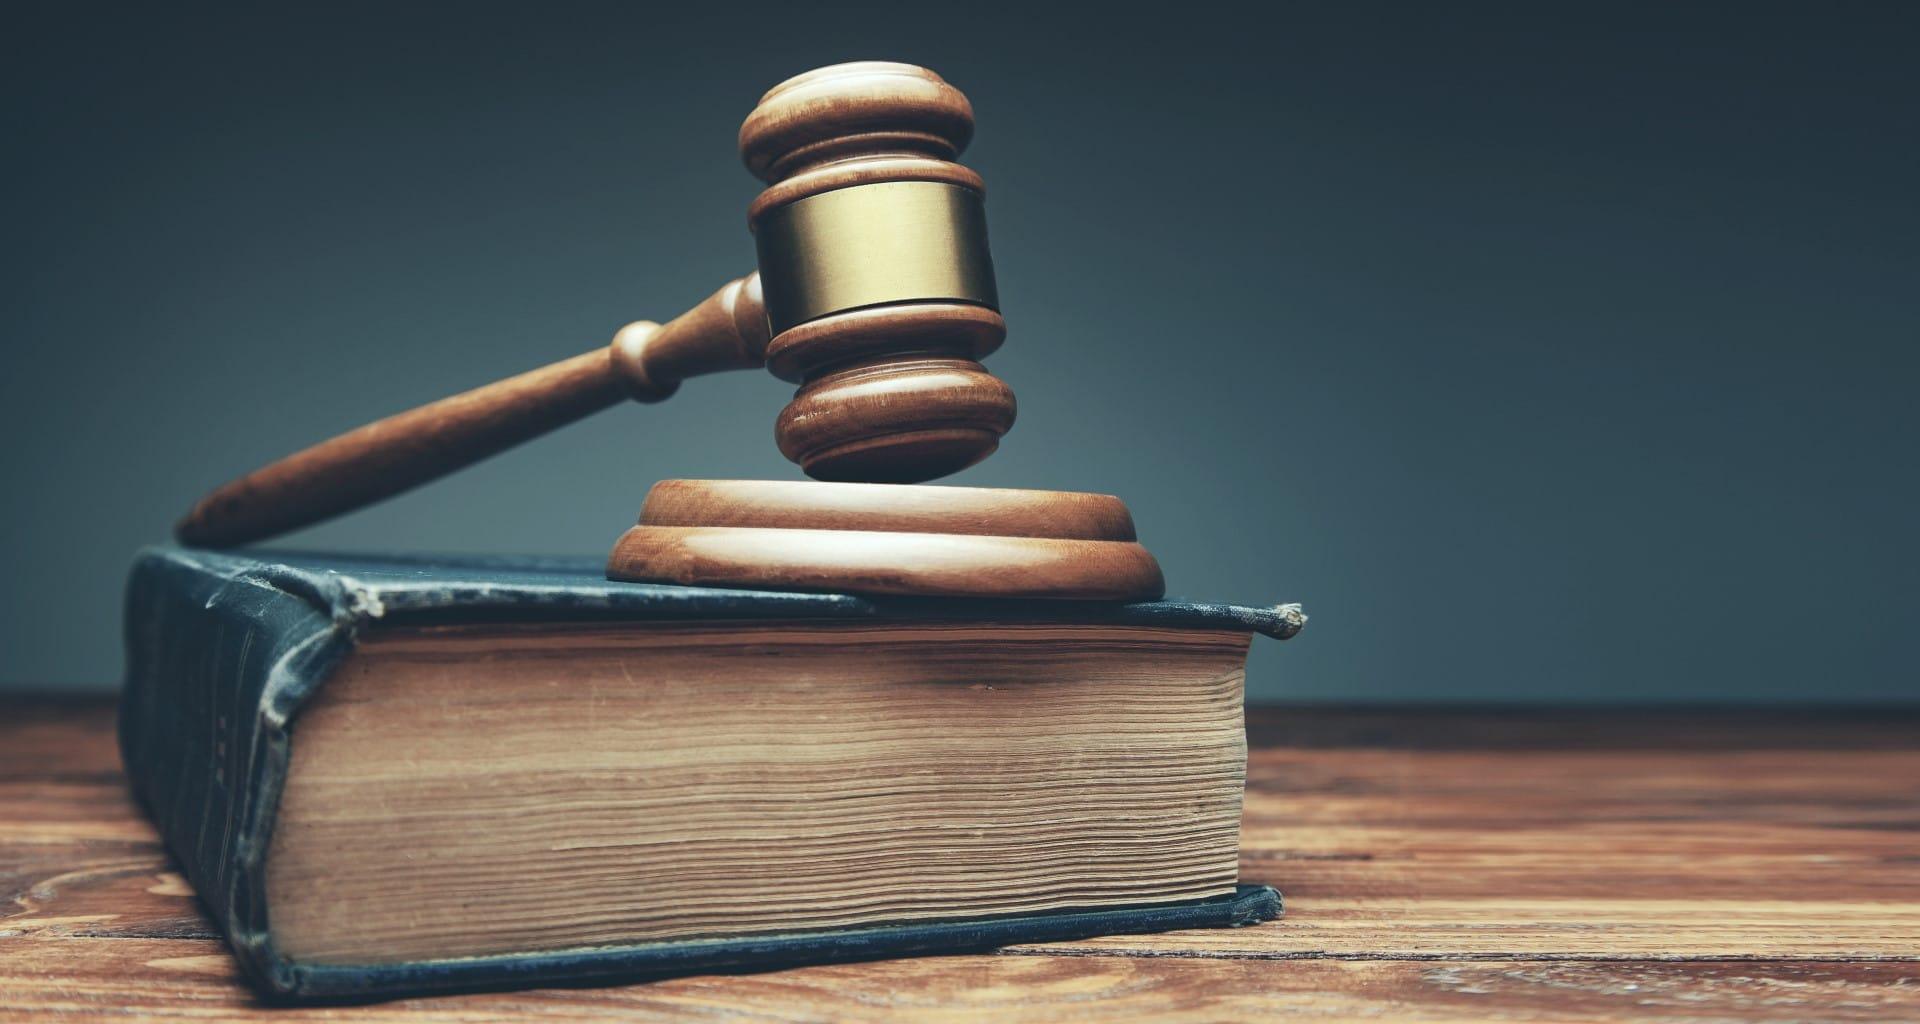 Understanding a misdemeanor vs. felony